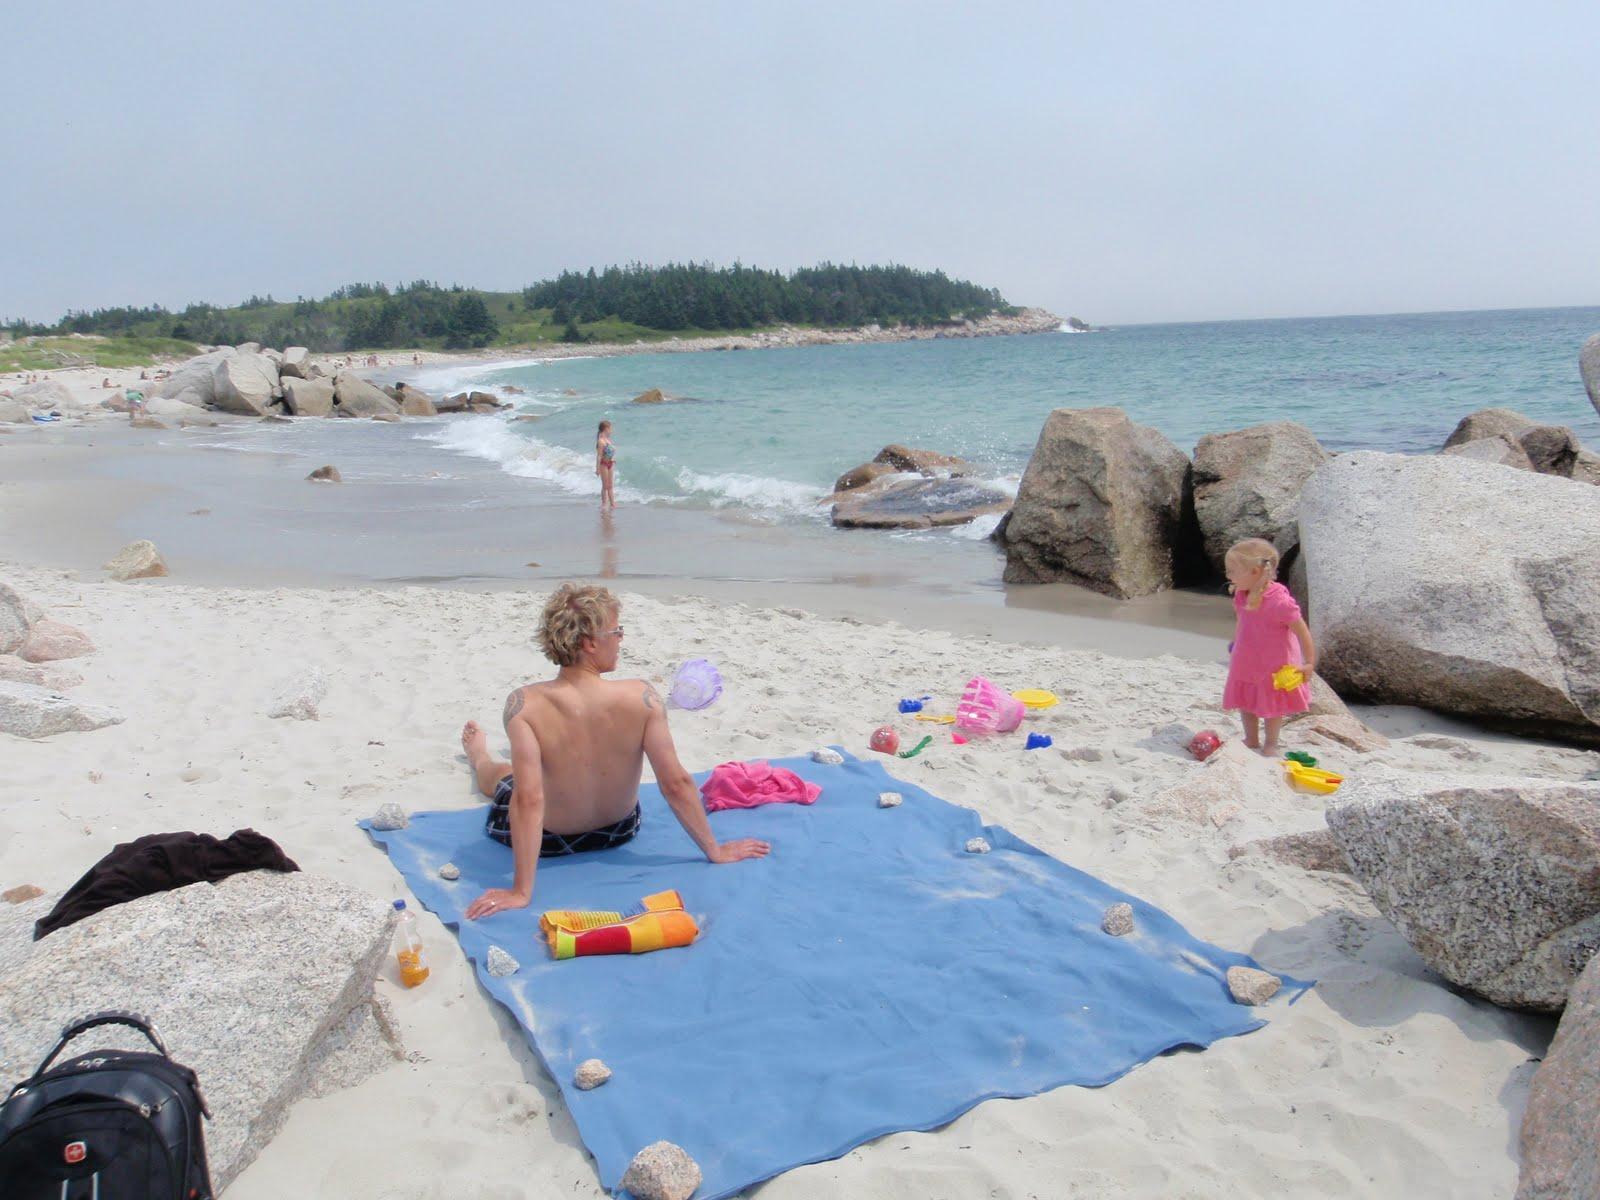 Crescent beach naturist area